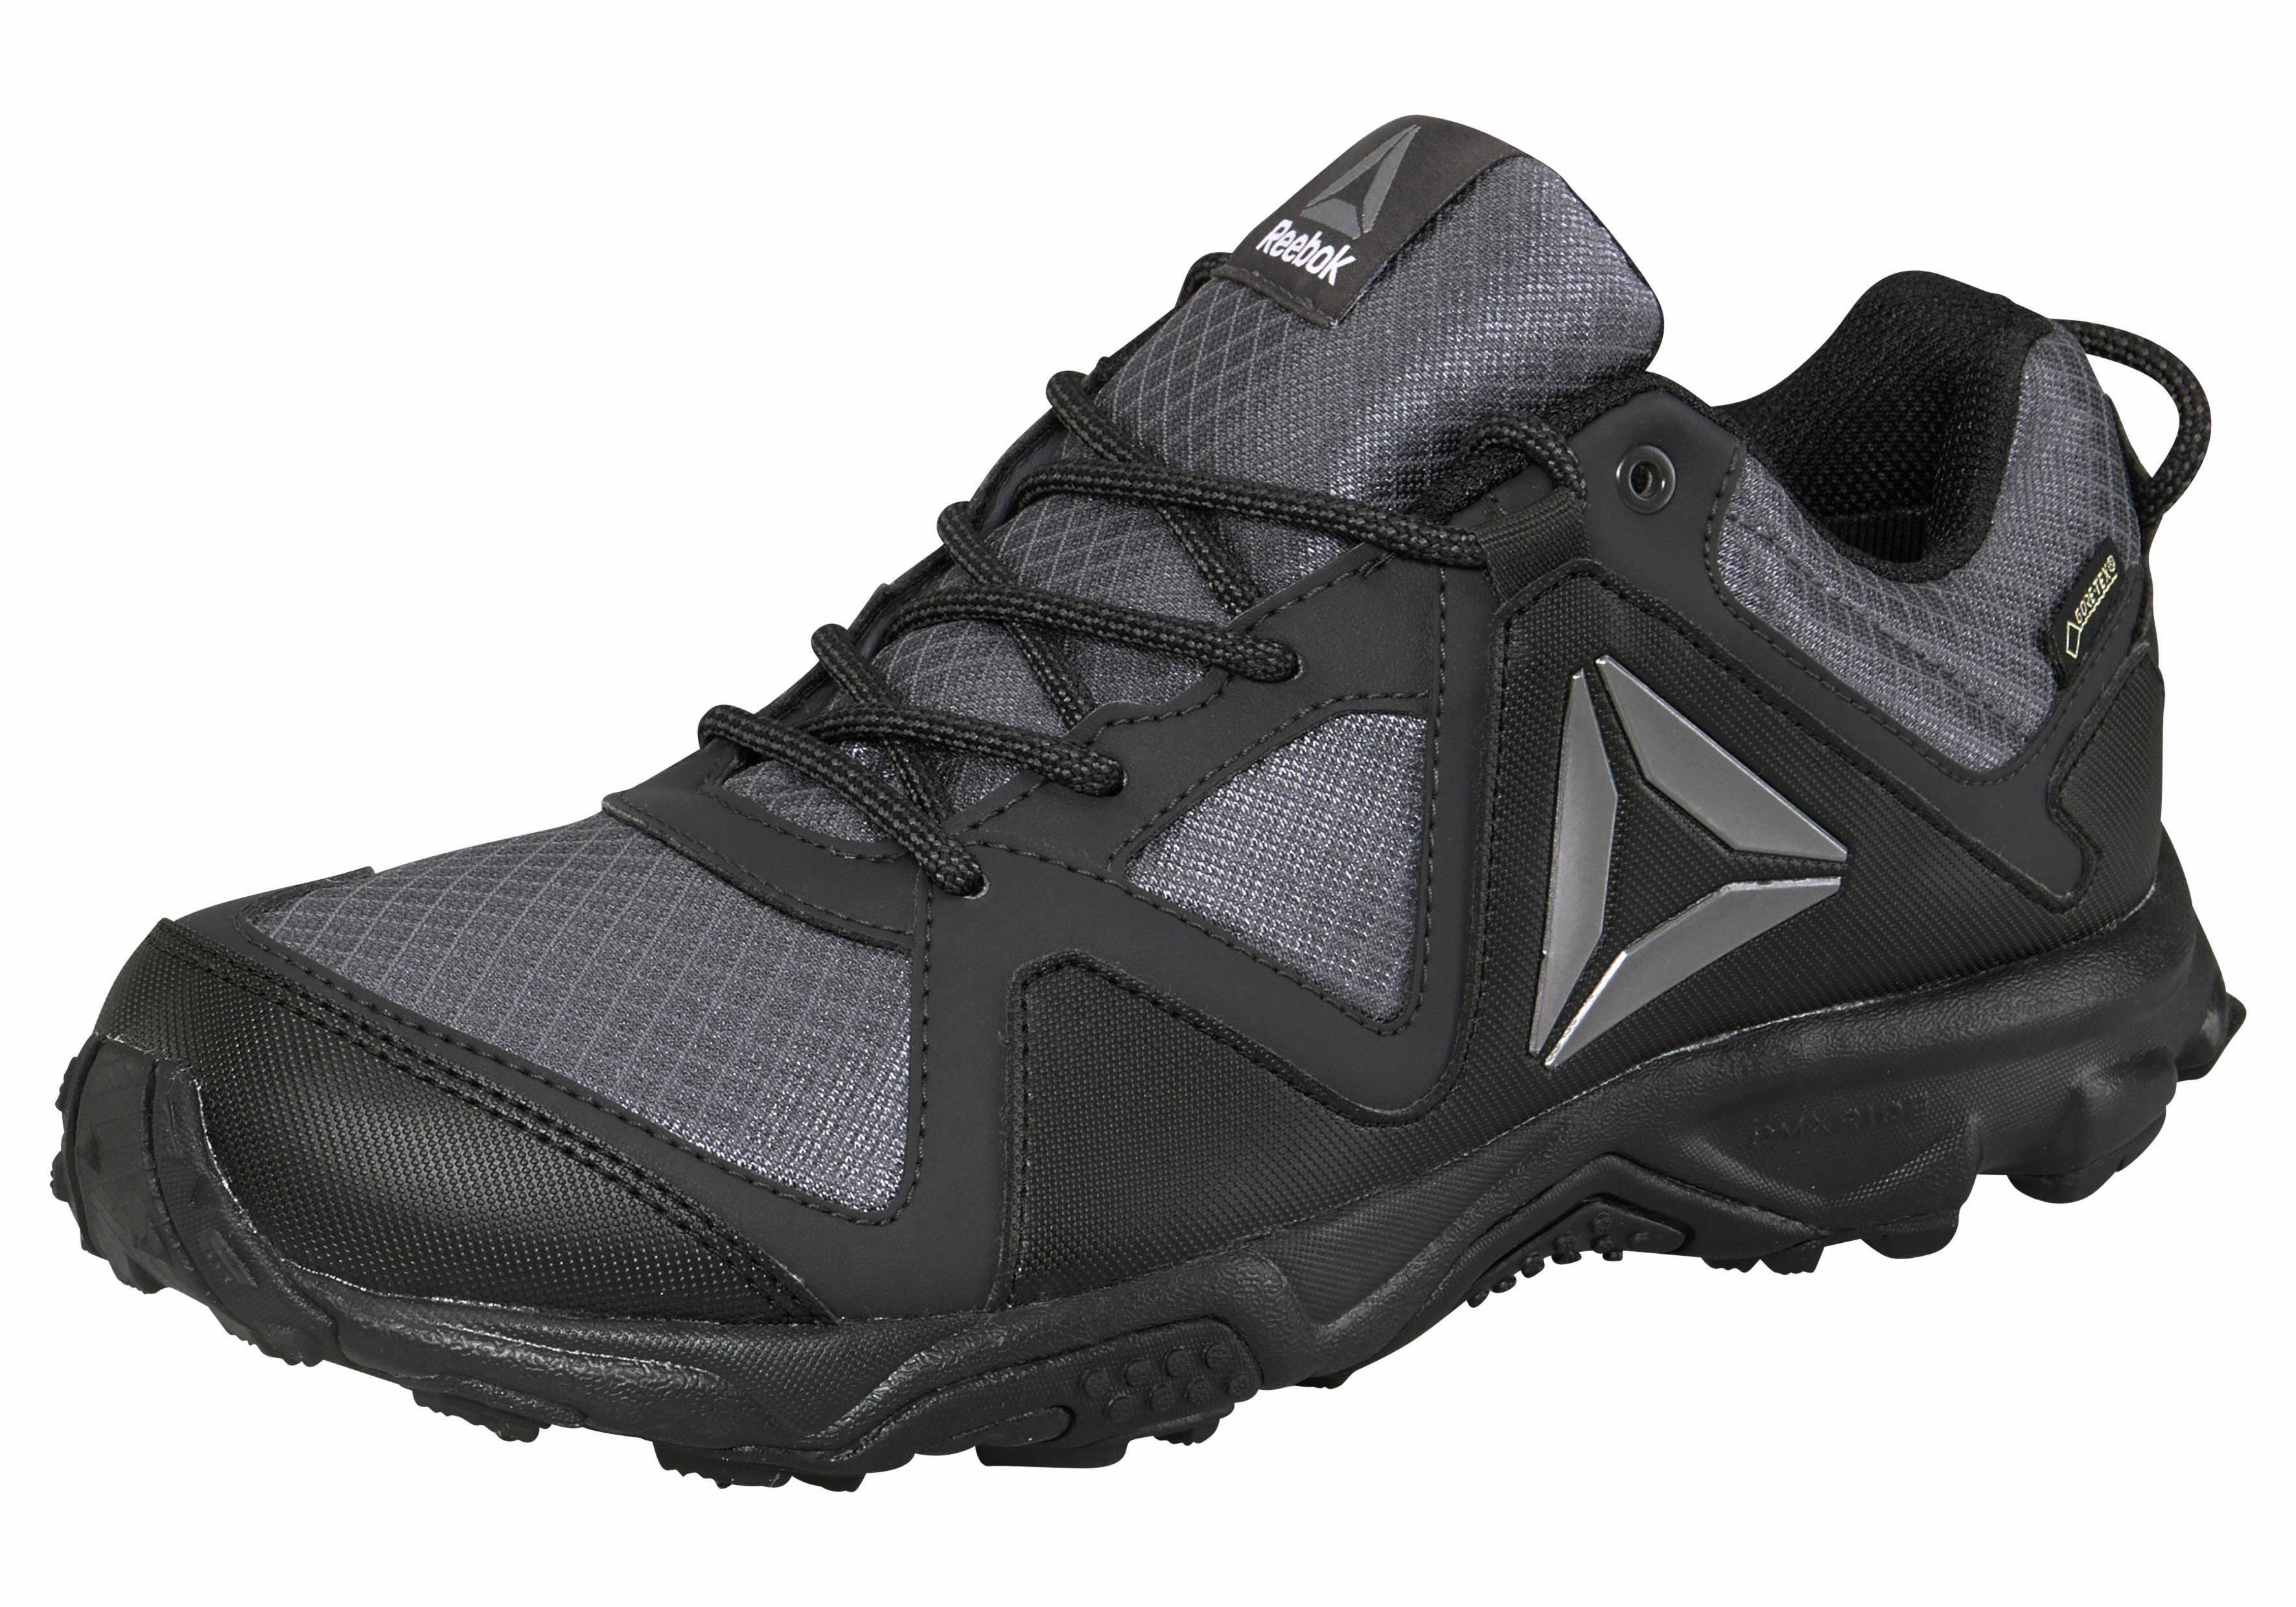 Reebok Franconia Ridge 30 Gore-Tex Walkingschuh  schwarz